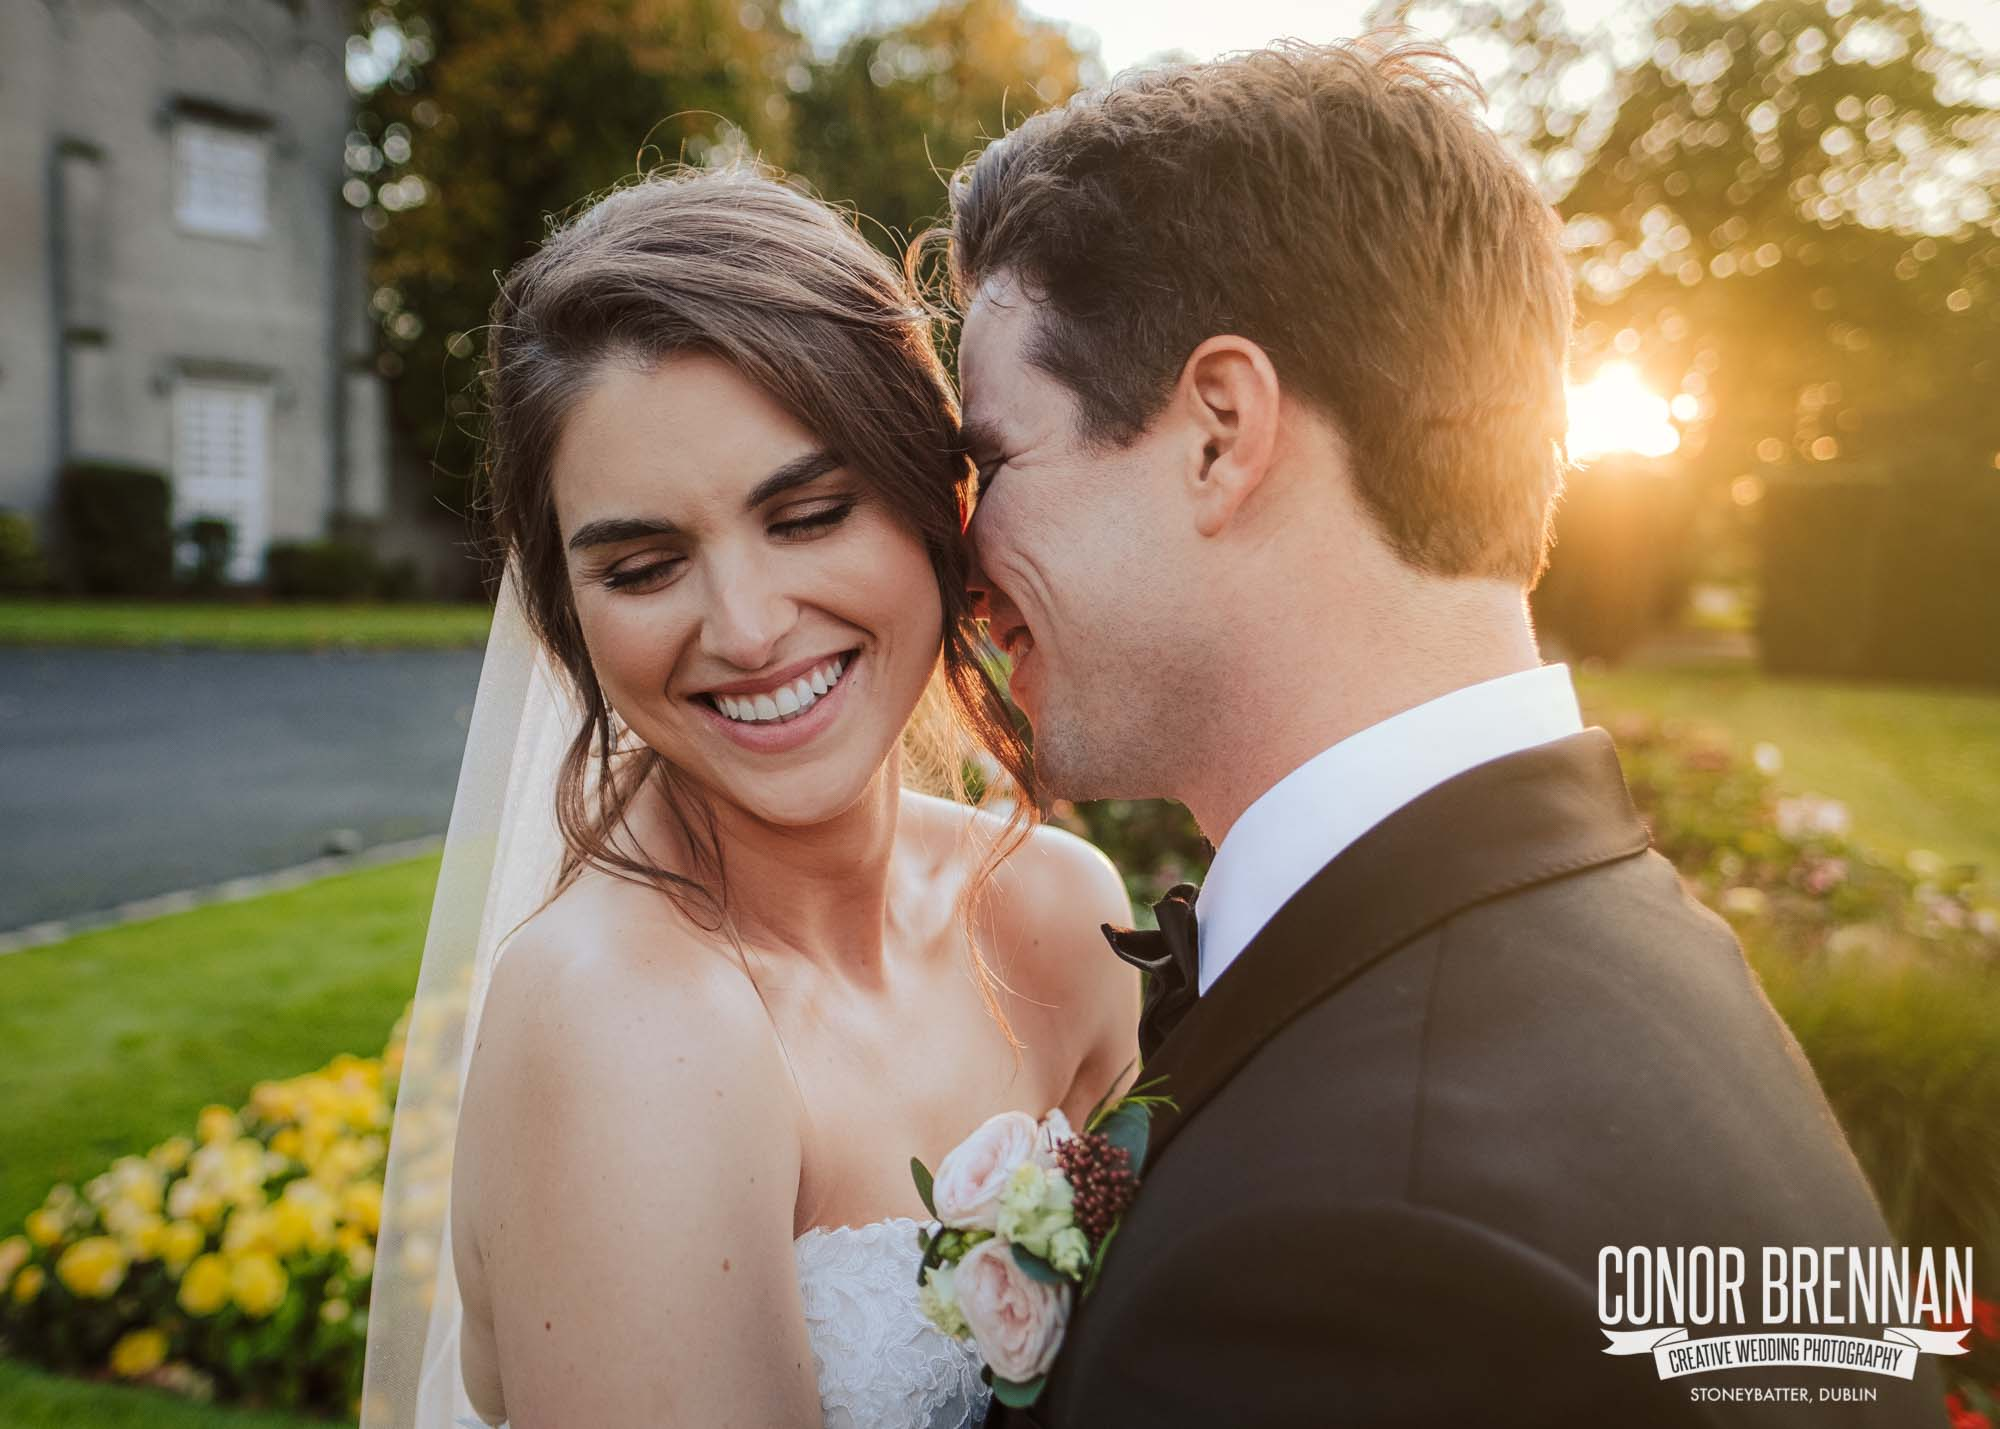 Luttrellstown Castle Wedding Photography by Conor Brennan Photography Dublin